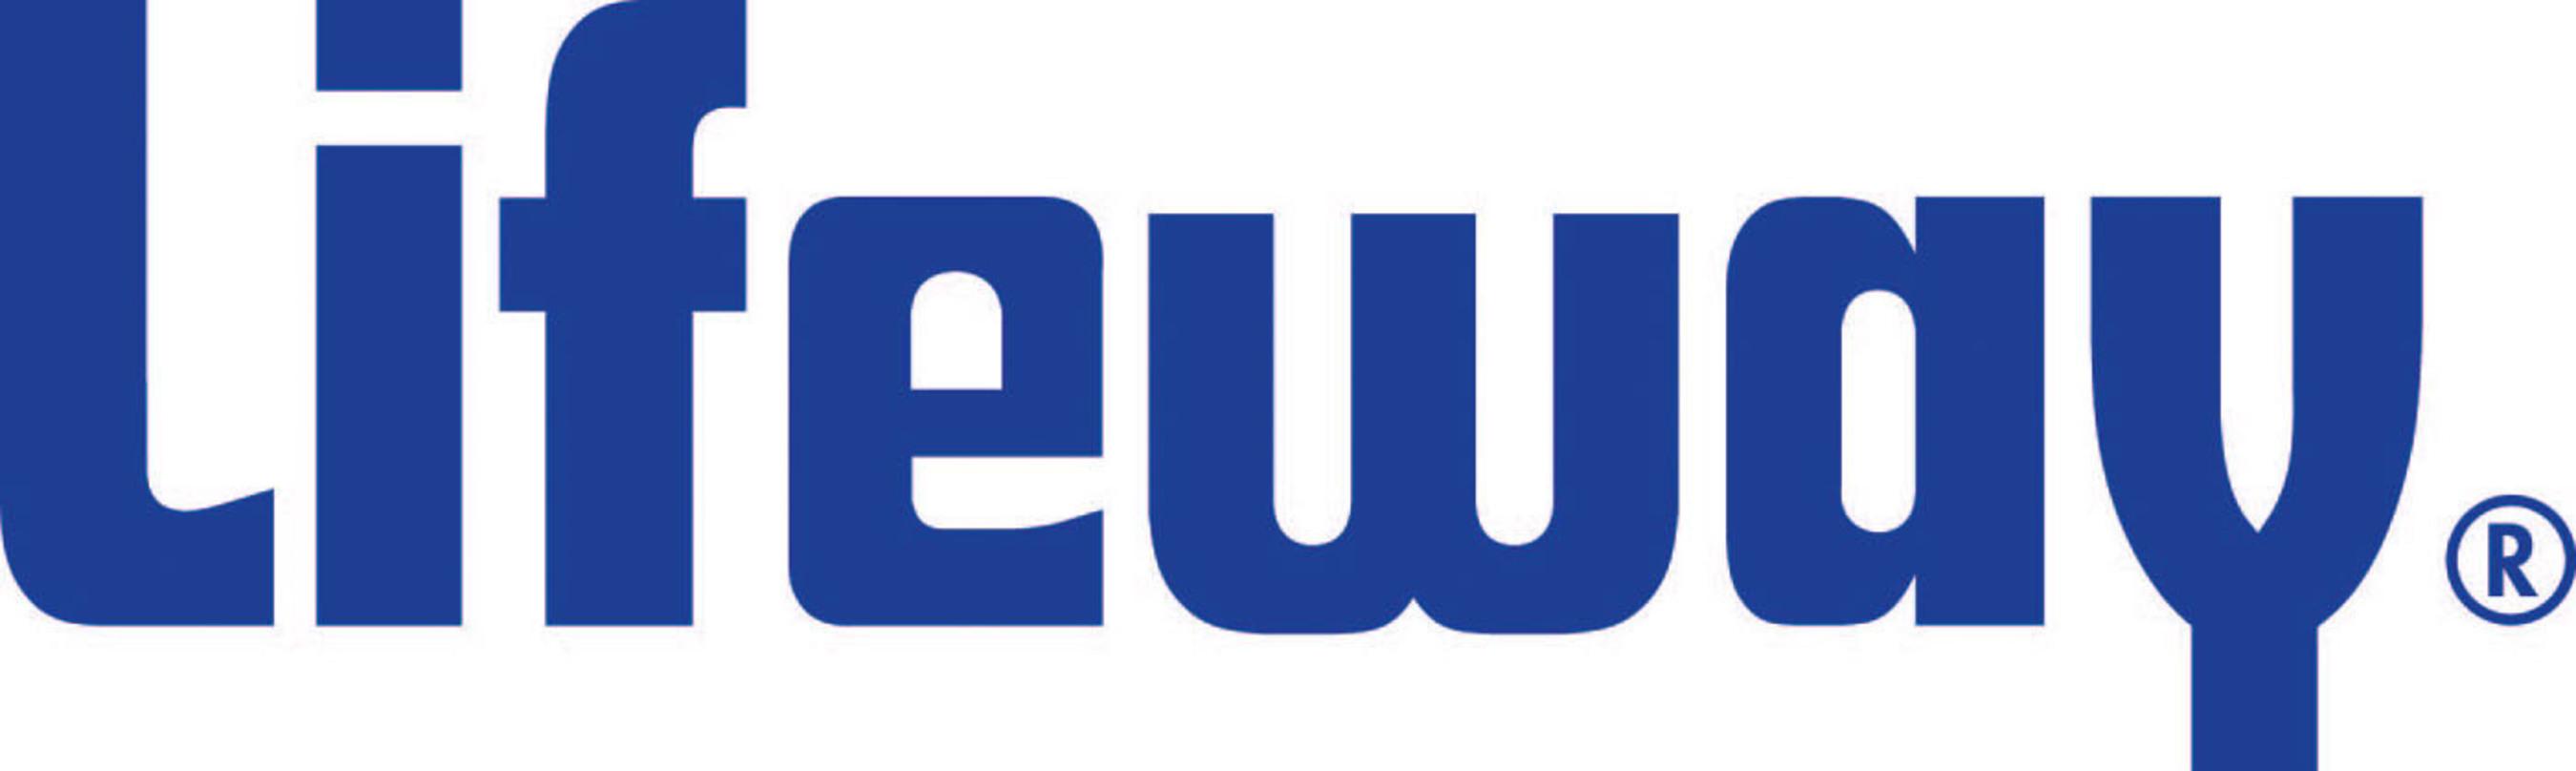 Lifeway Foods logo.